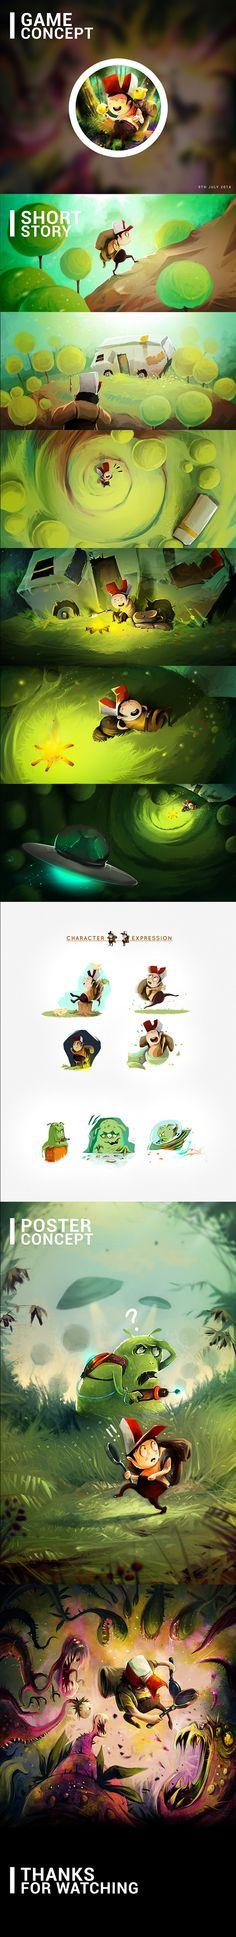 Game Concept  by Afanur Rashid, via Behance